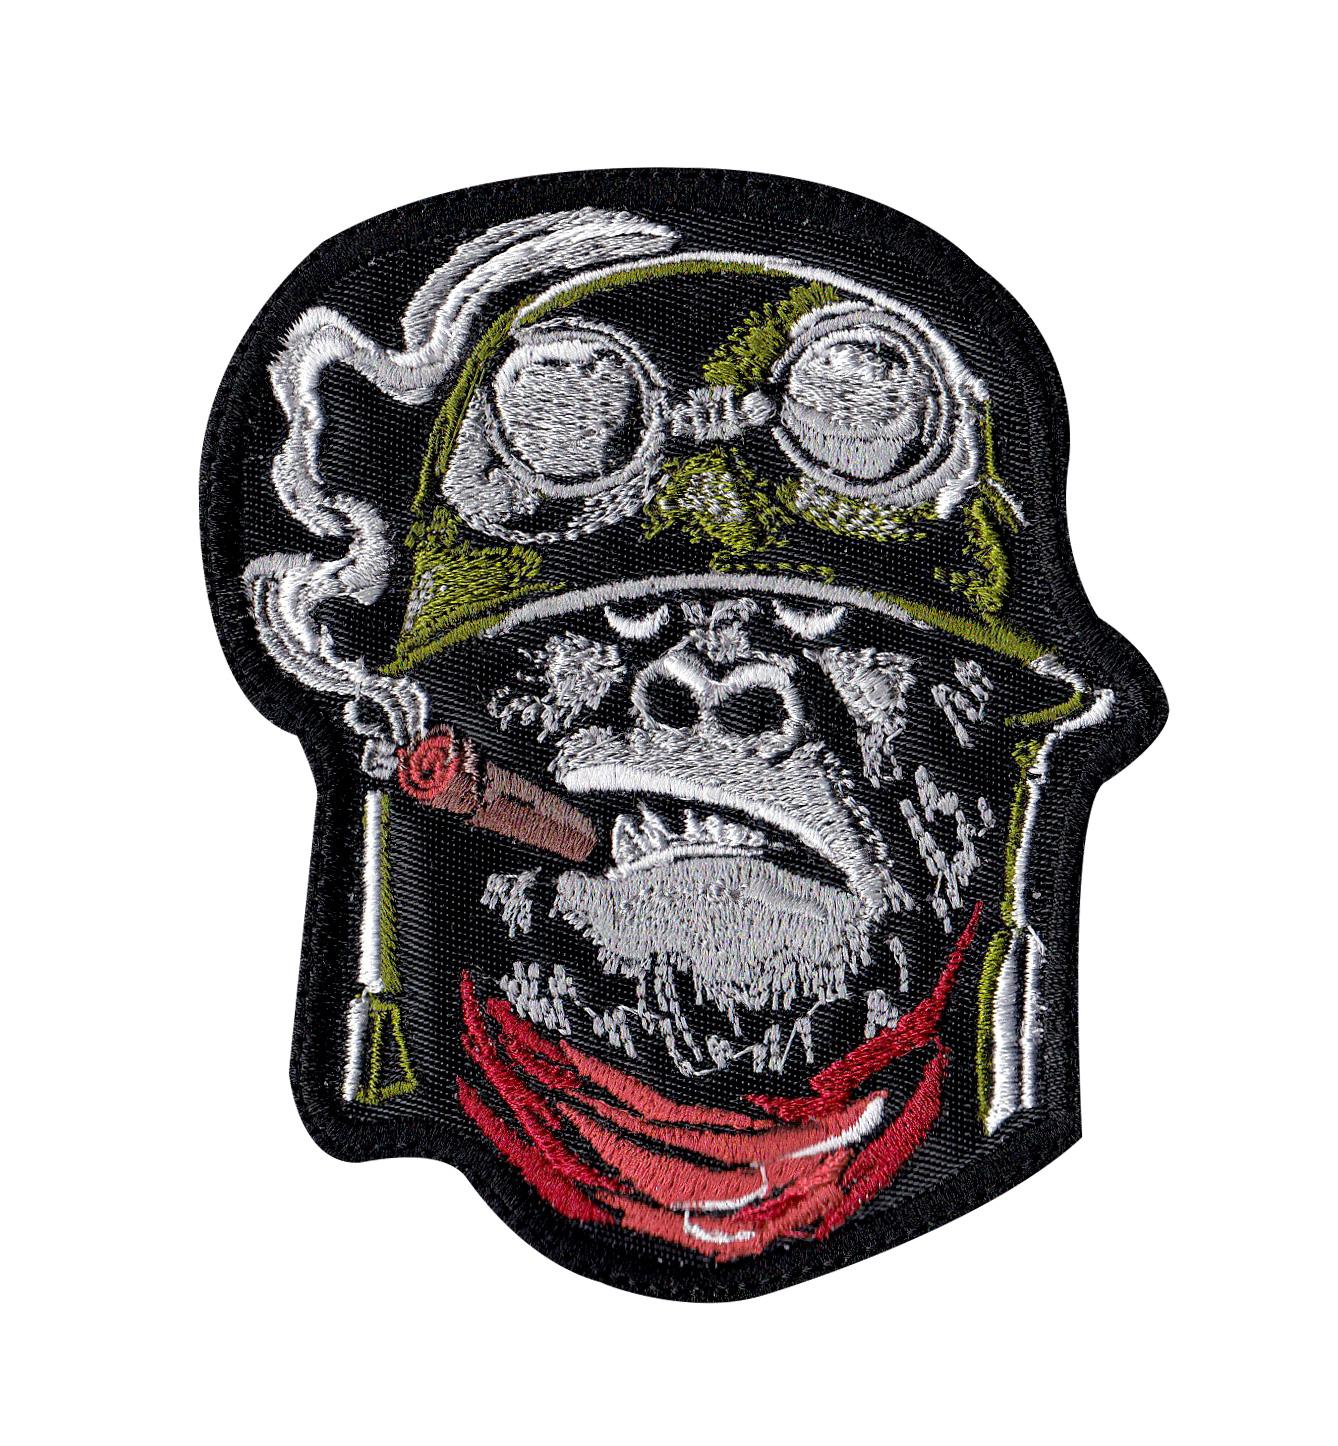 cigar_monkeys_motor_brigad_logo_emblema_1.jpg